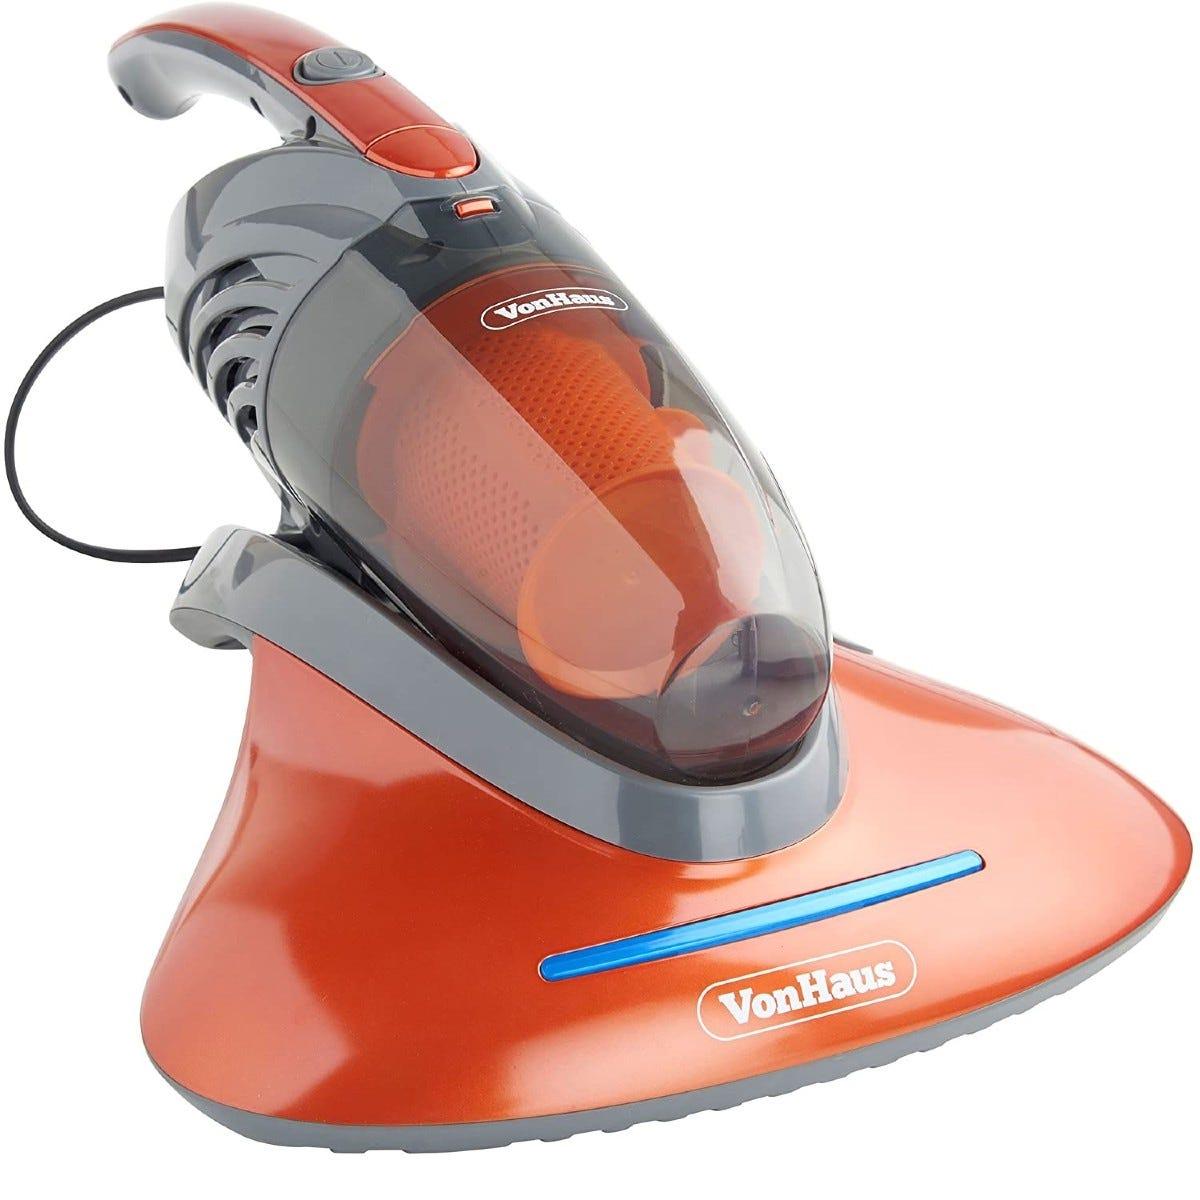 VonHaus Handheld Corded Vacuum Cleaner with UV Light - Red